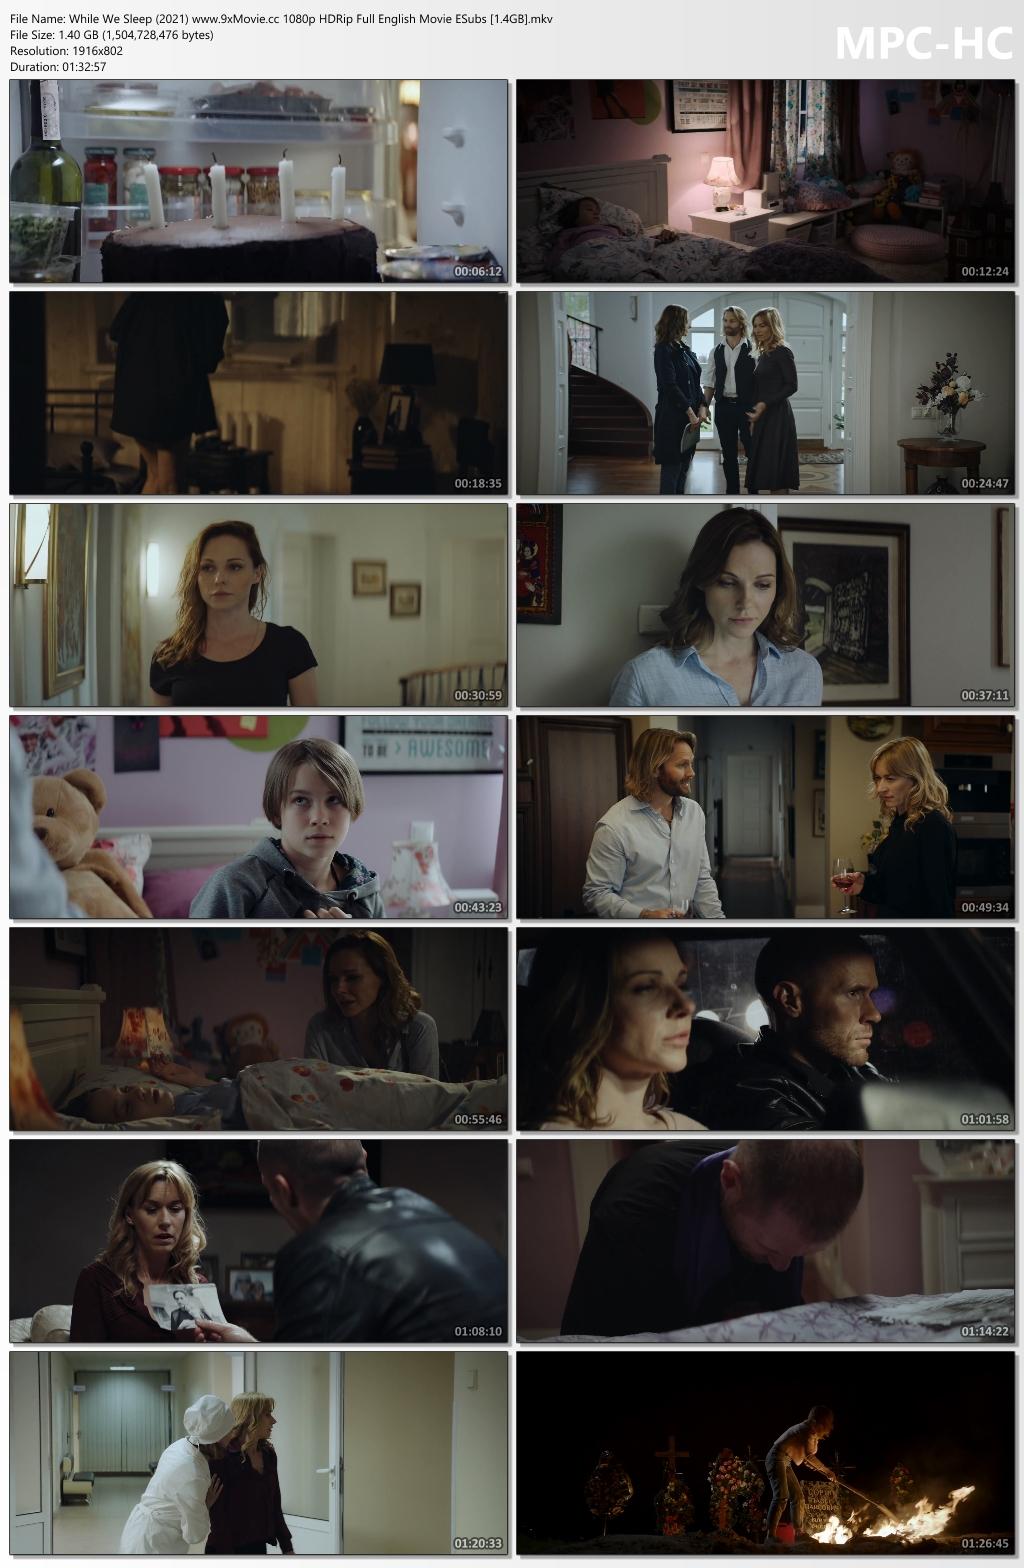 While-We-Sleep-2021-www-9x-Movie-cc-1080p-HDRip-Full-English-Movie-ESubs-1-4-GB-mkv